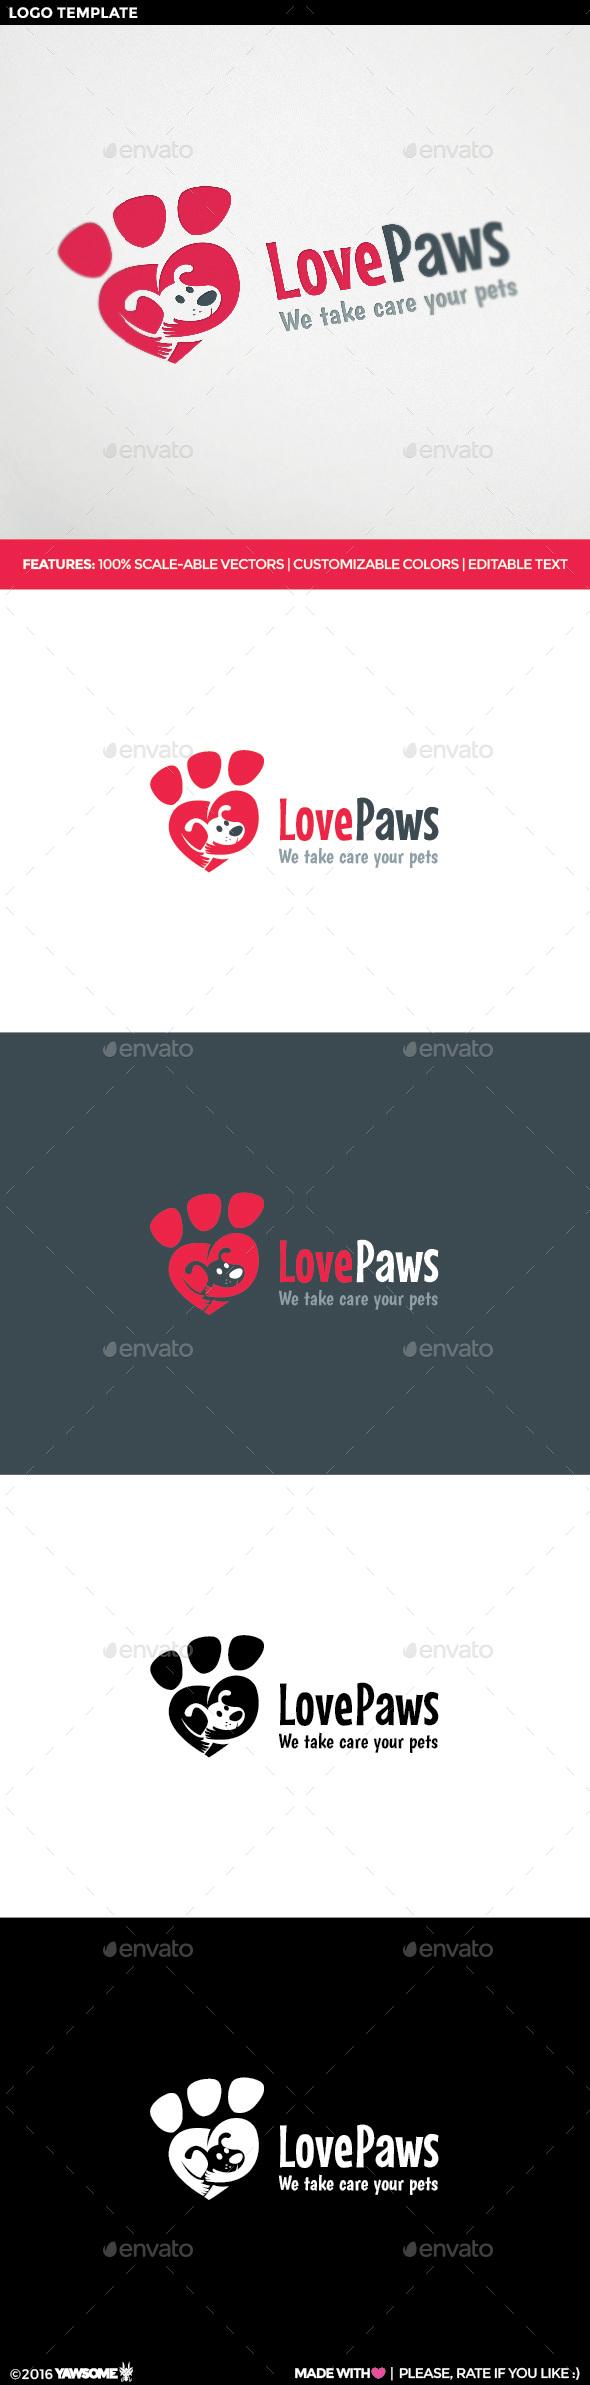 Love Paws Logo - Animals Logo Templates